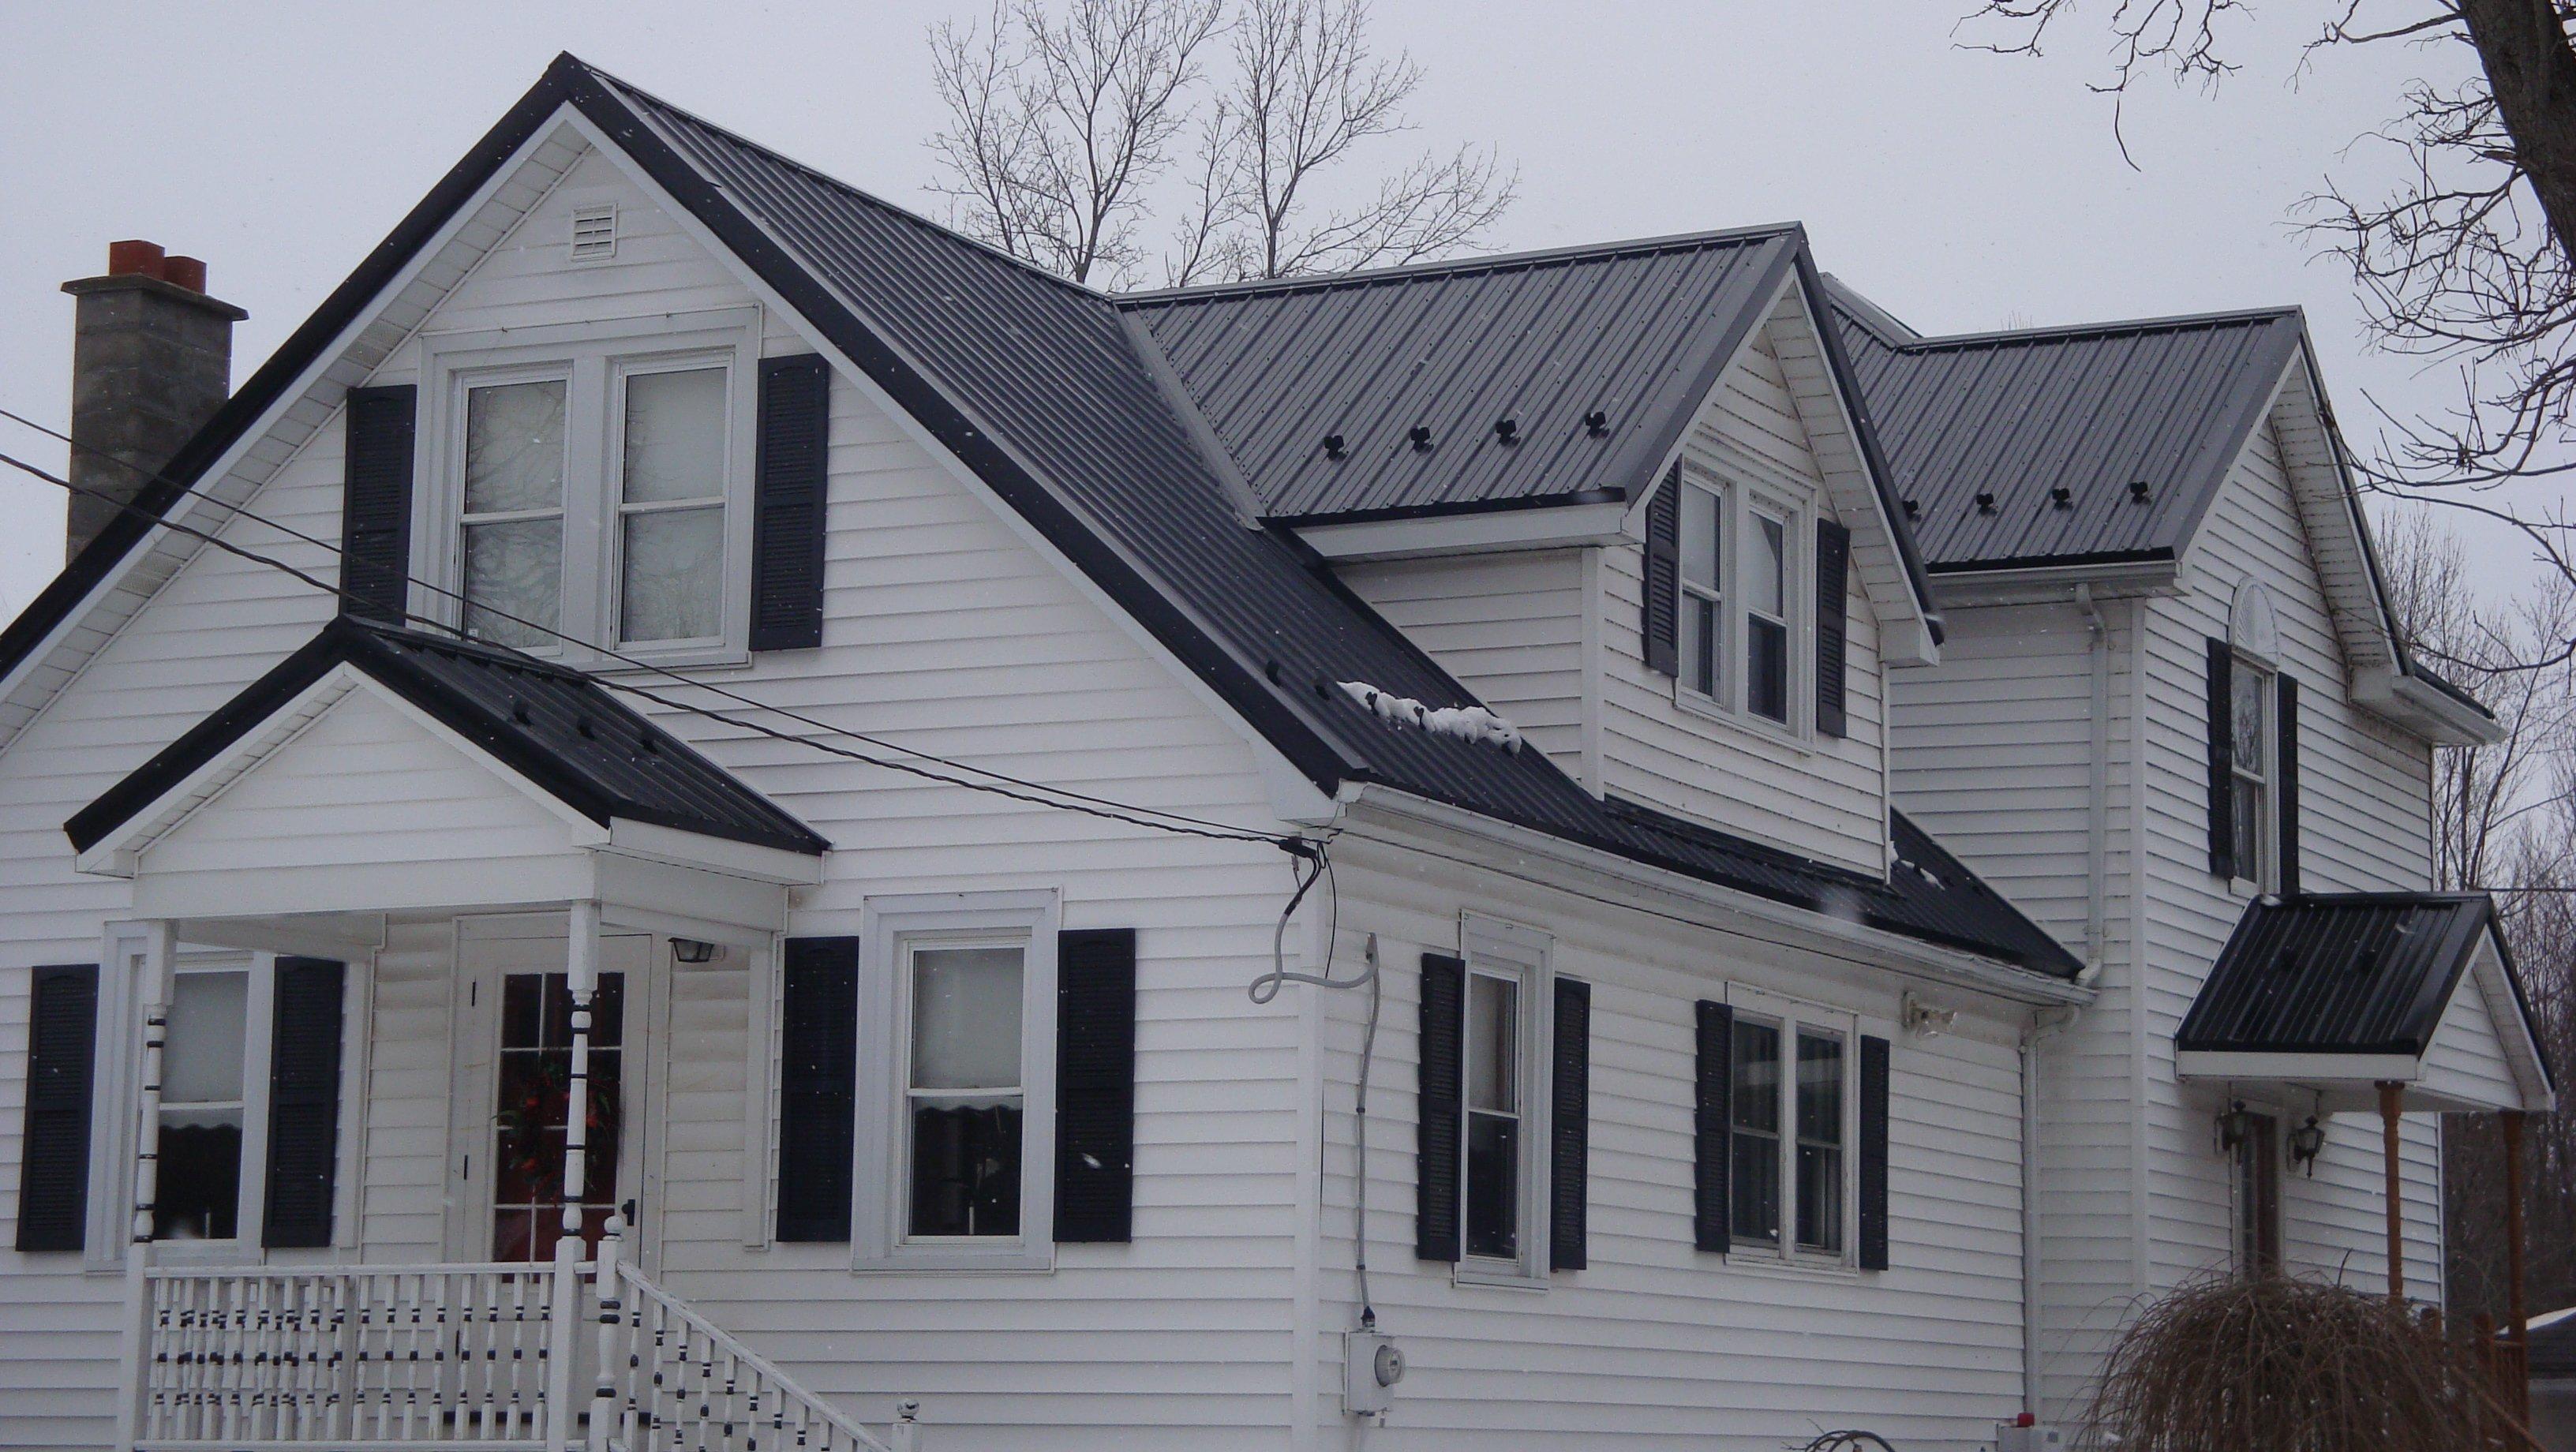 Home in Niagara Falls NY, Roofing Repair